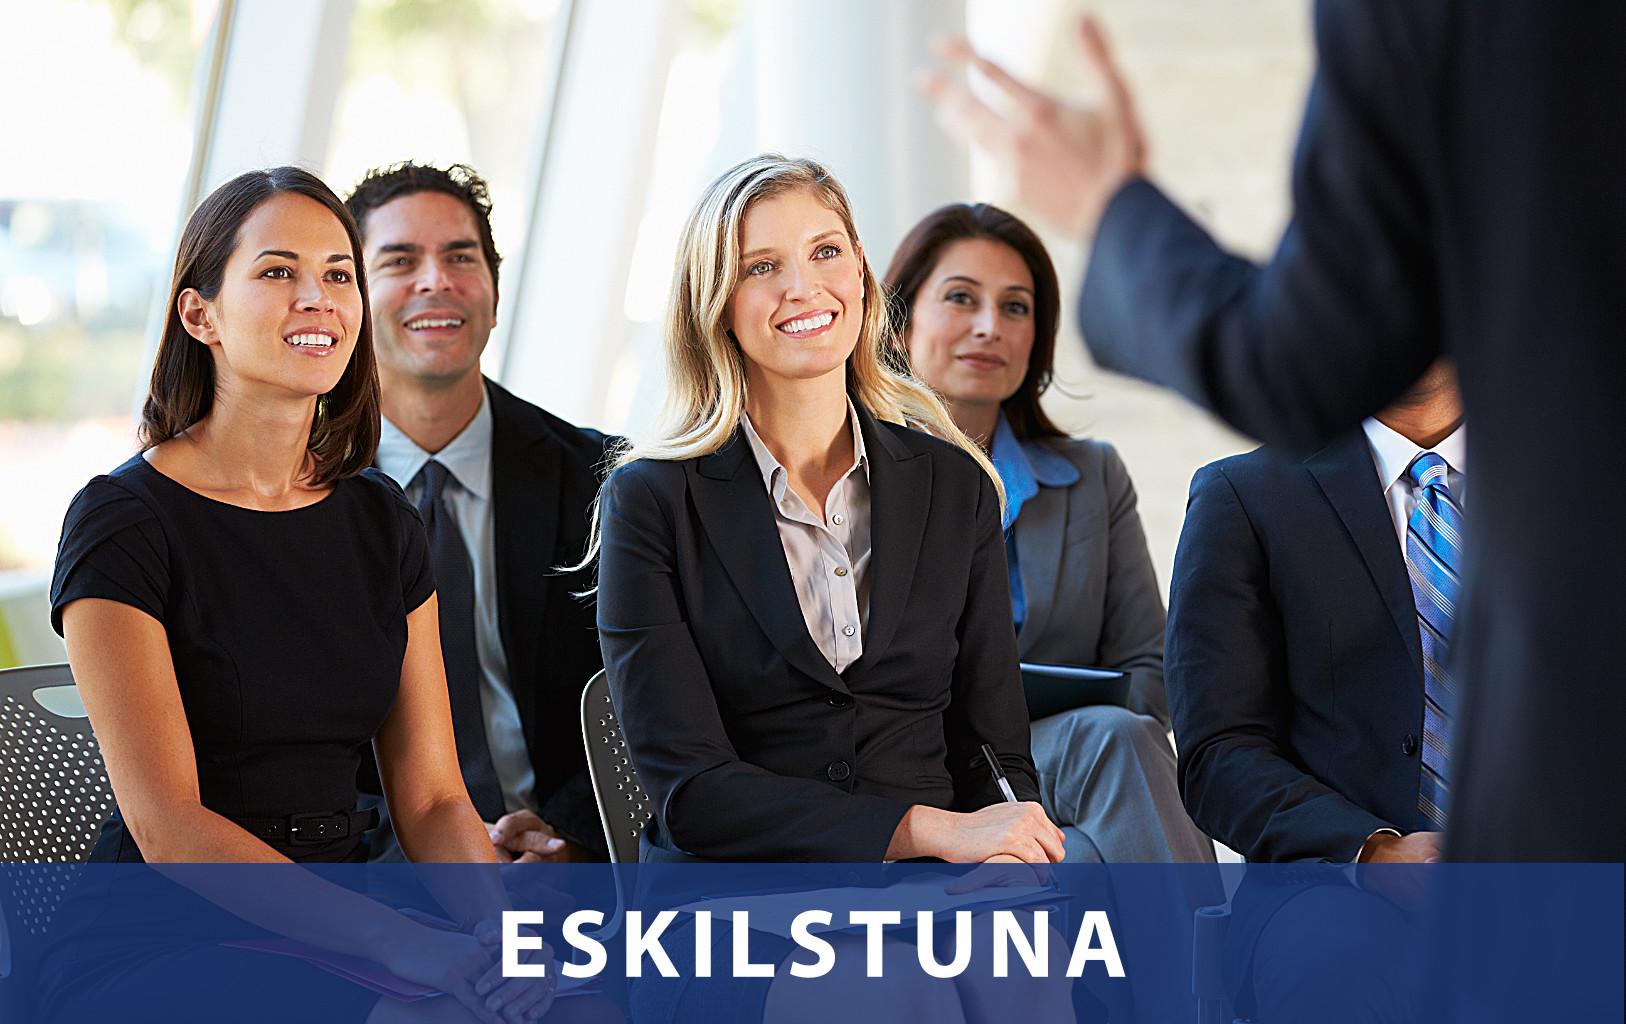 Ayurvedisk grundkurs i Eskilstuna